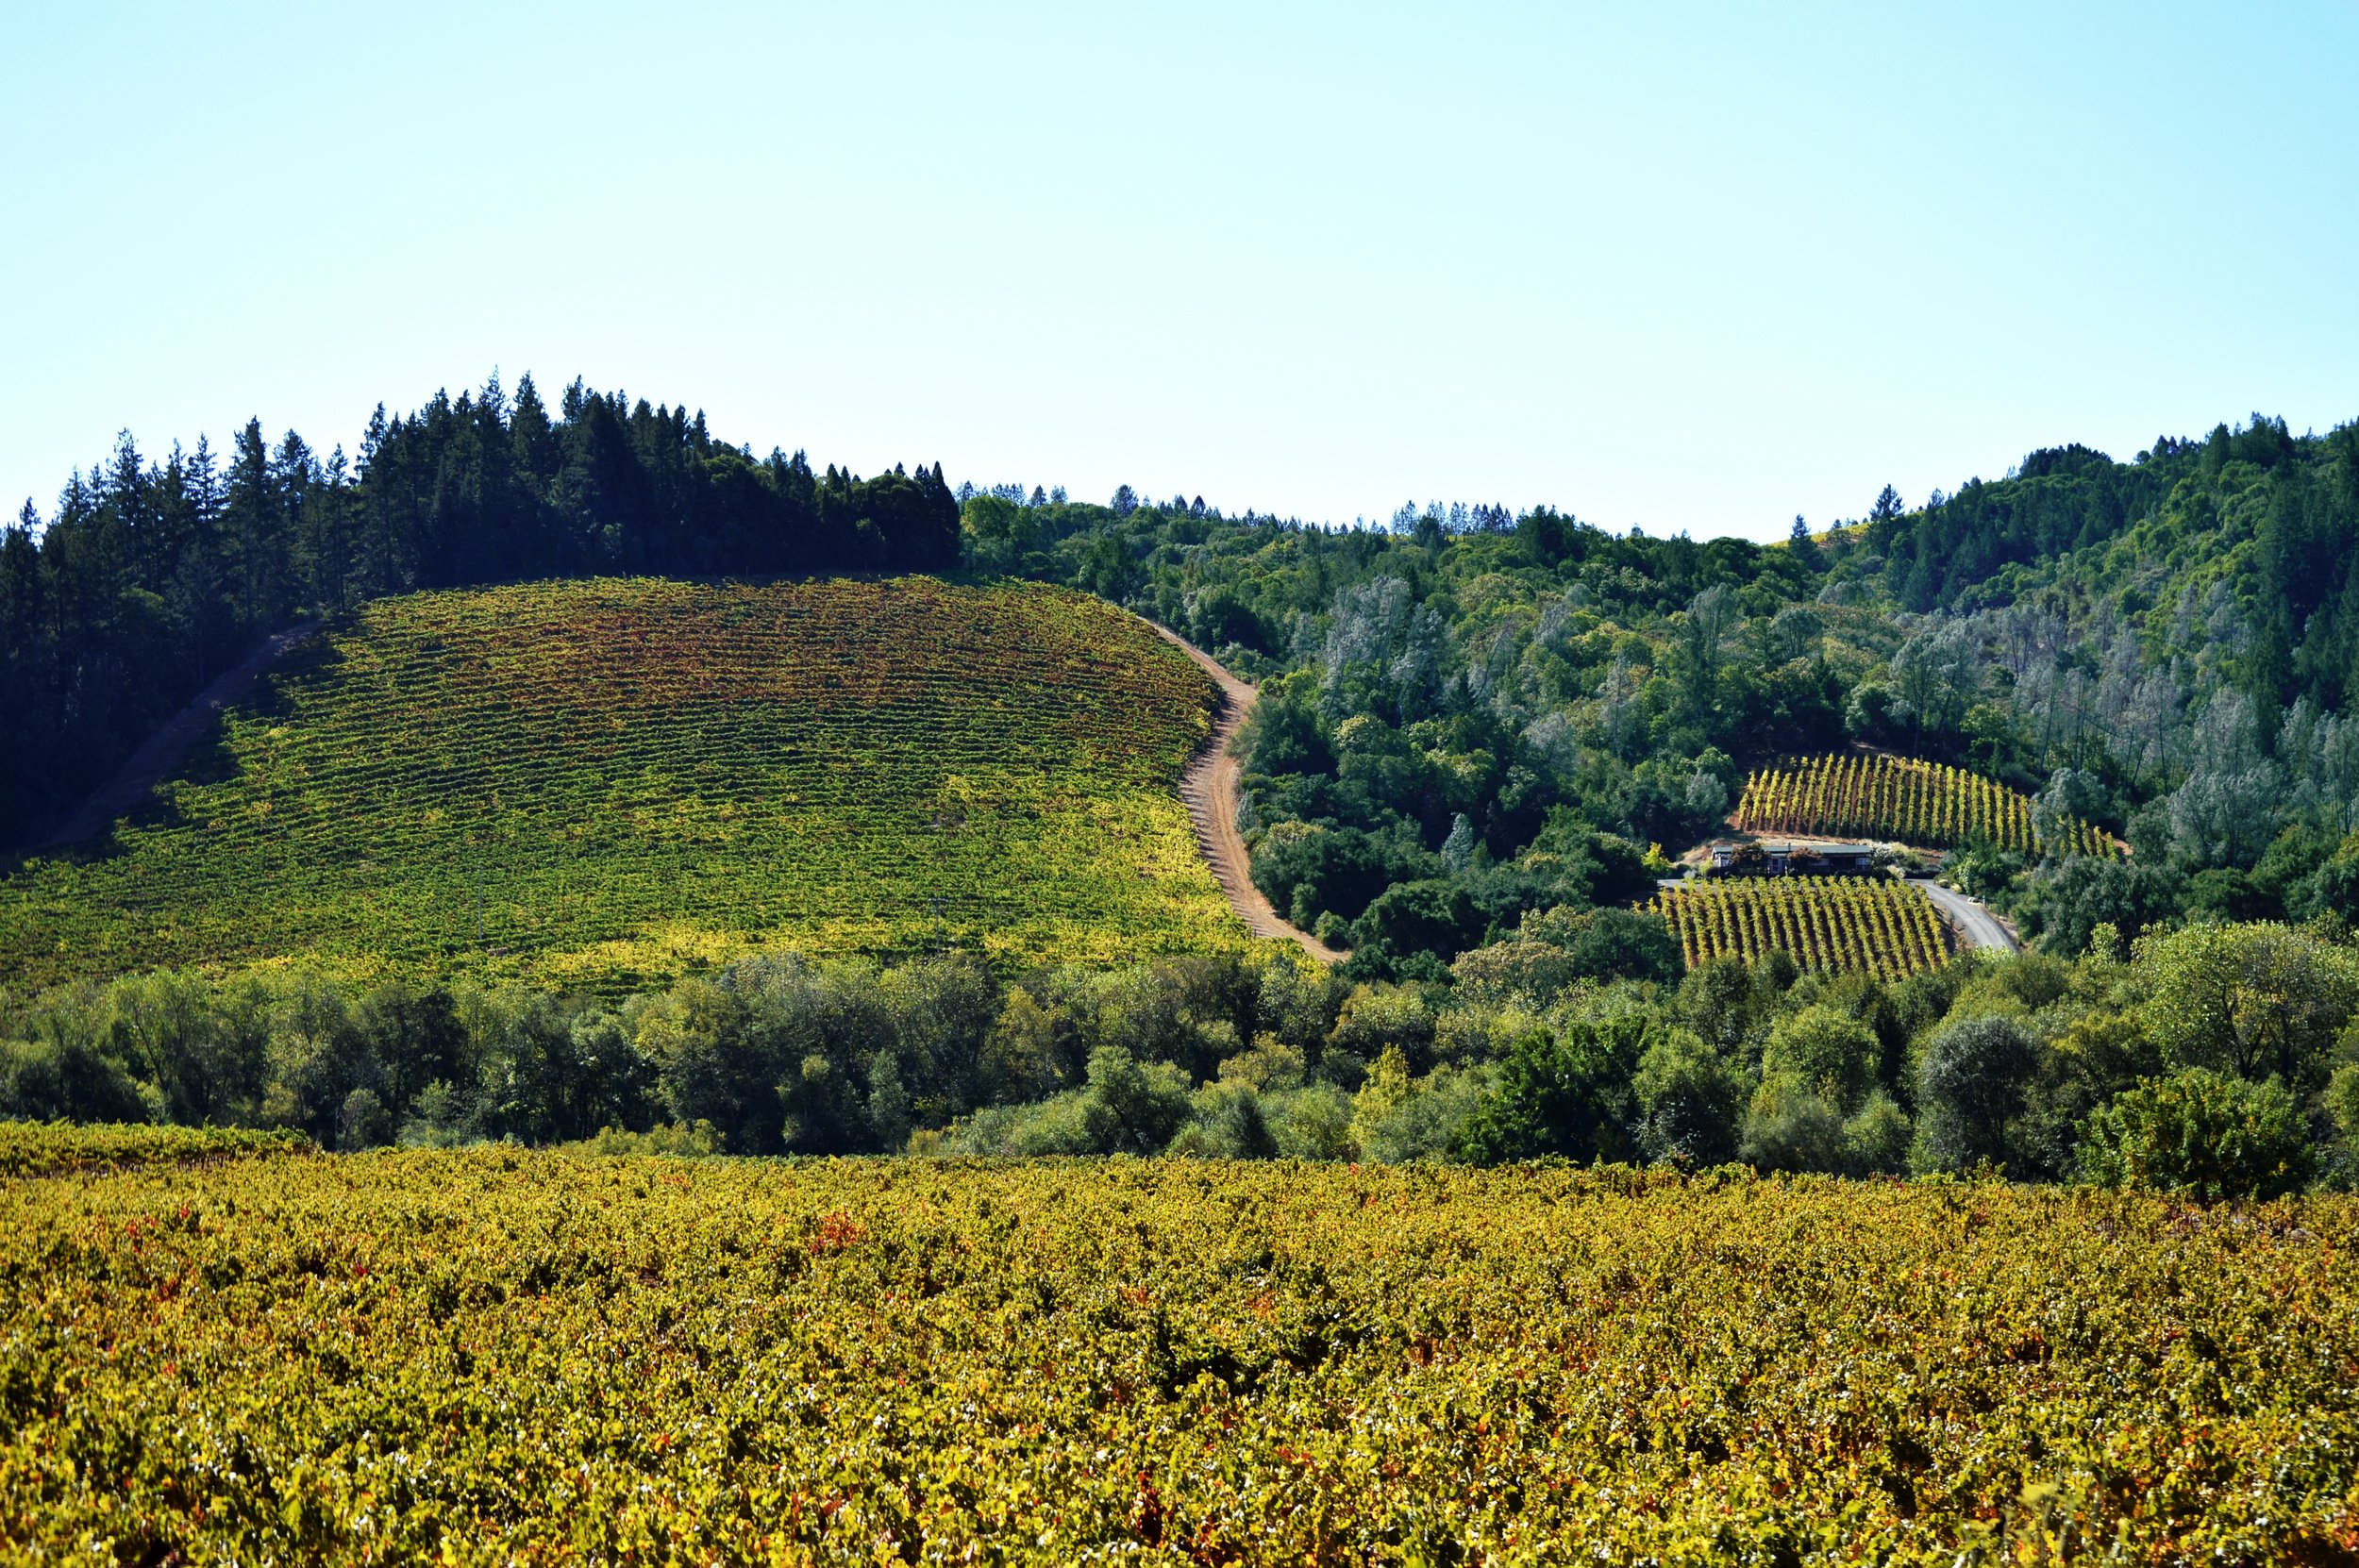 Vineyard-WorkingLands_SonomaCounty-CA.jpg